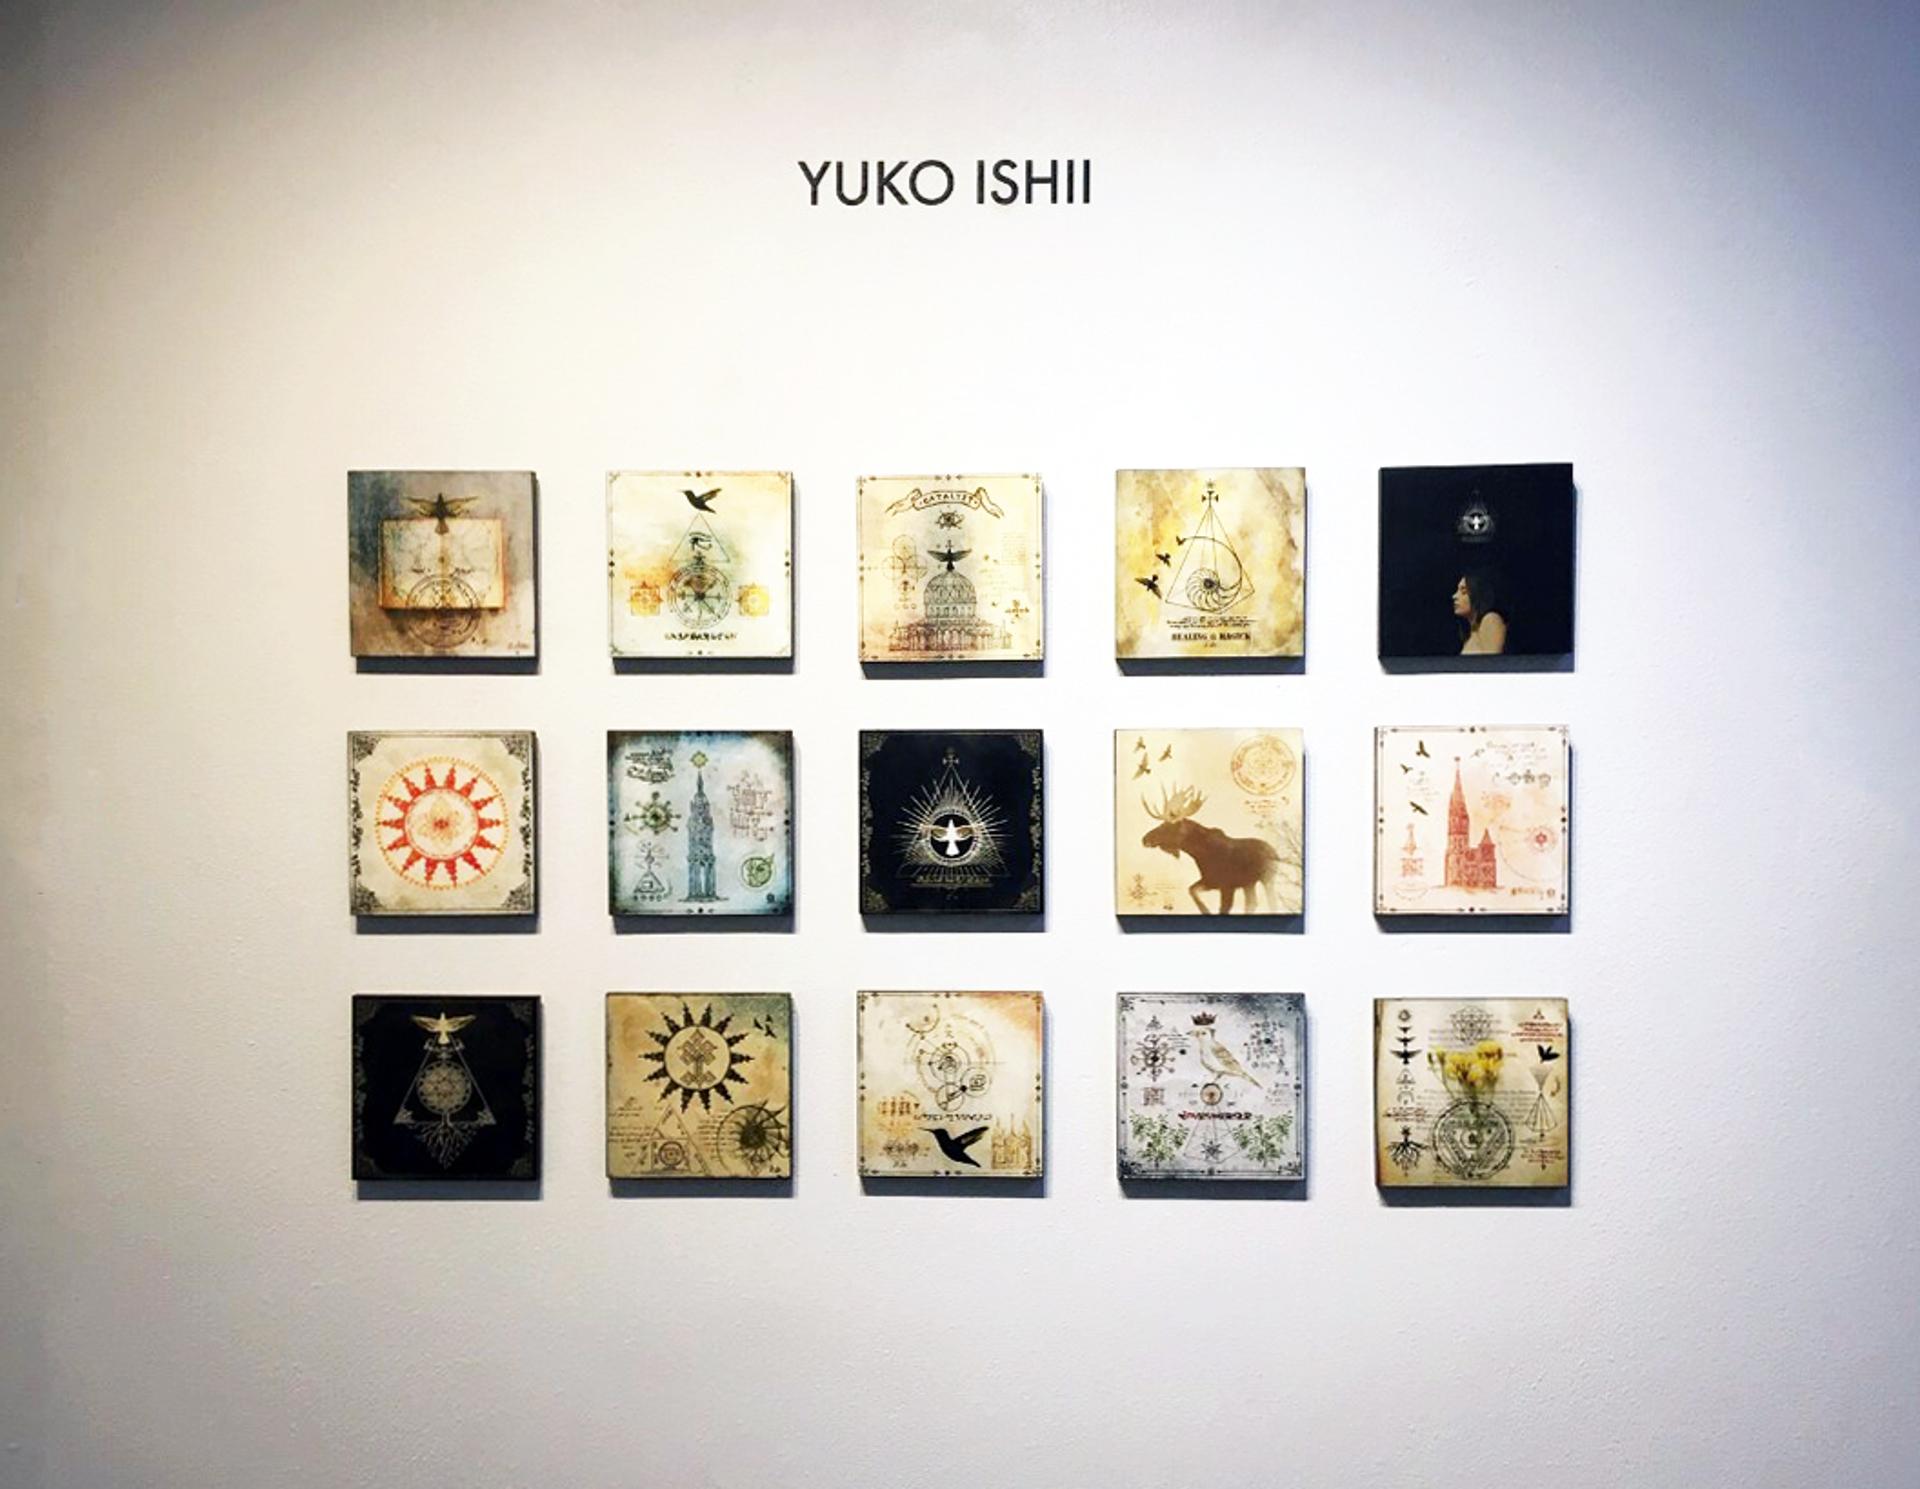 The Sun of Miri by Yuko Ishii